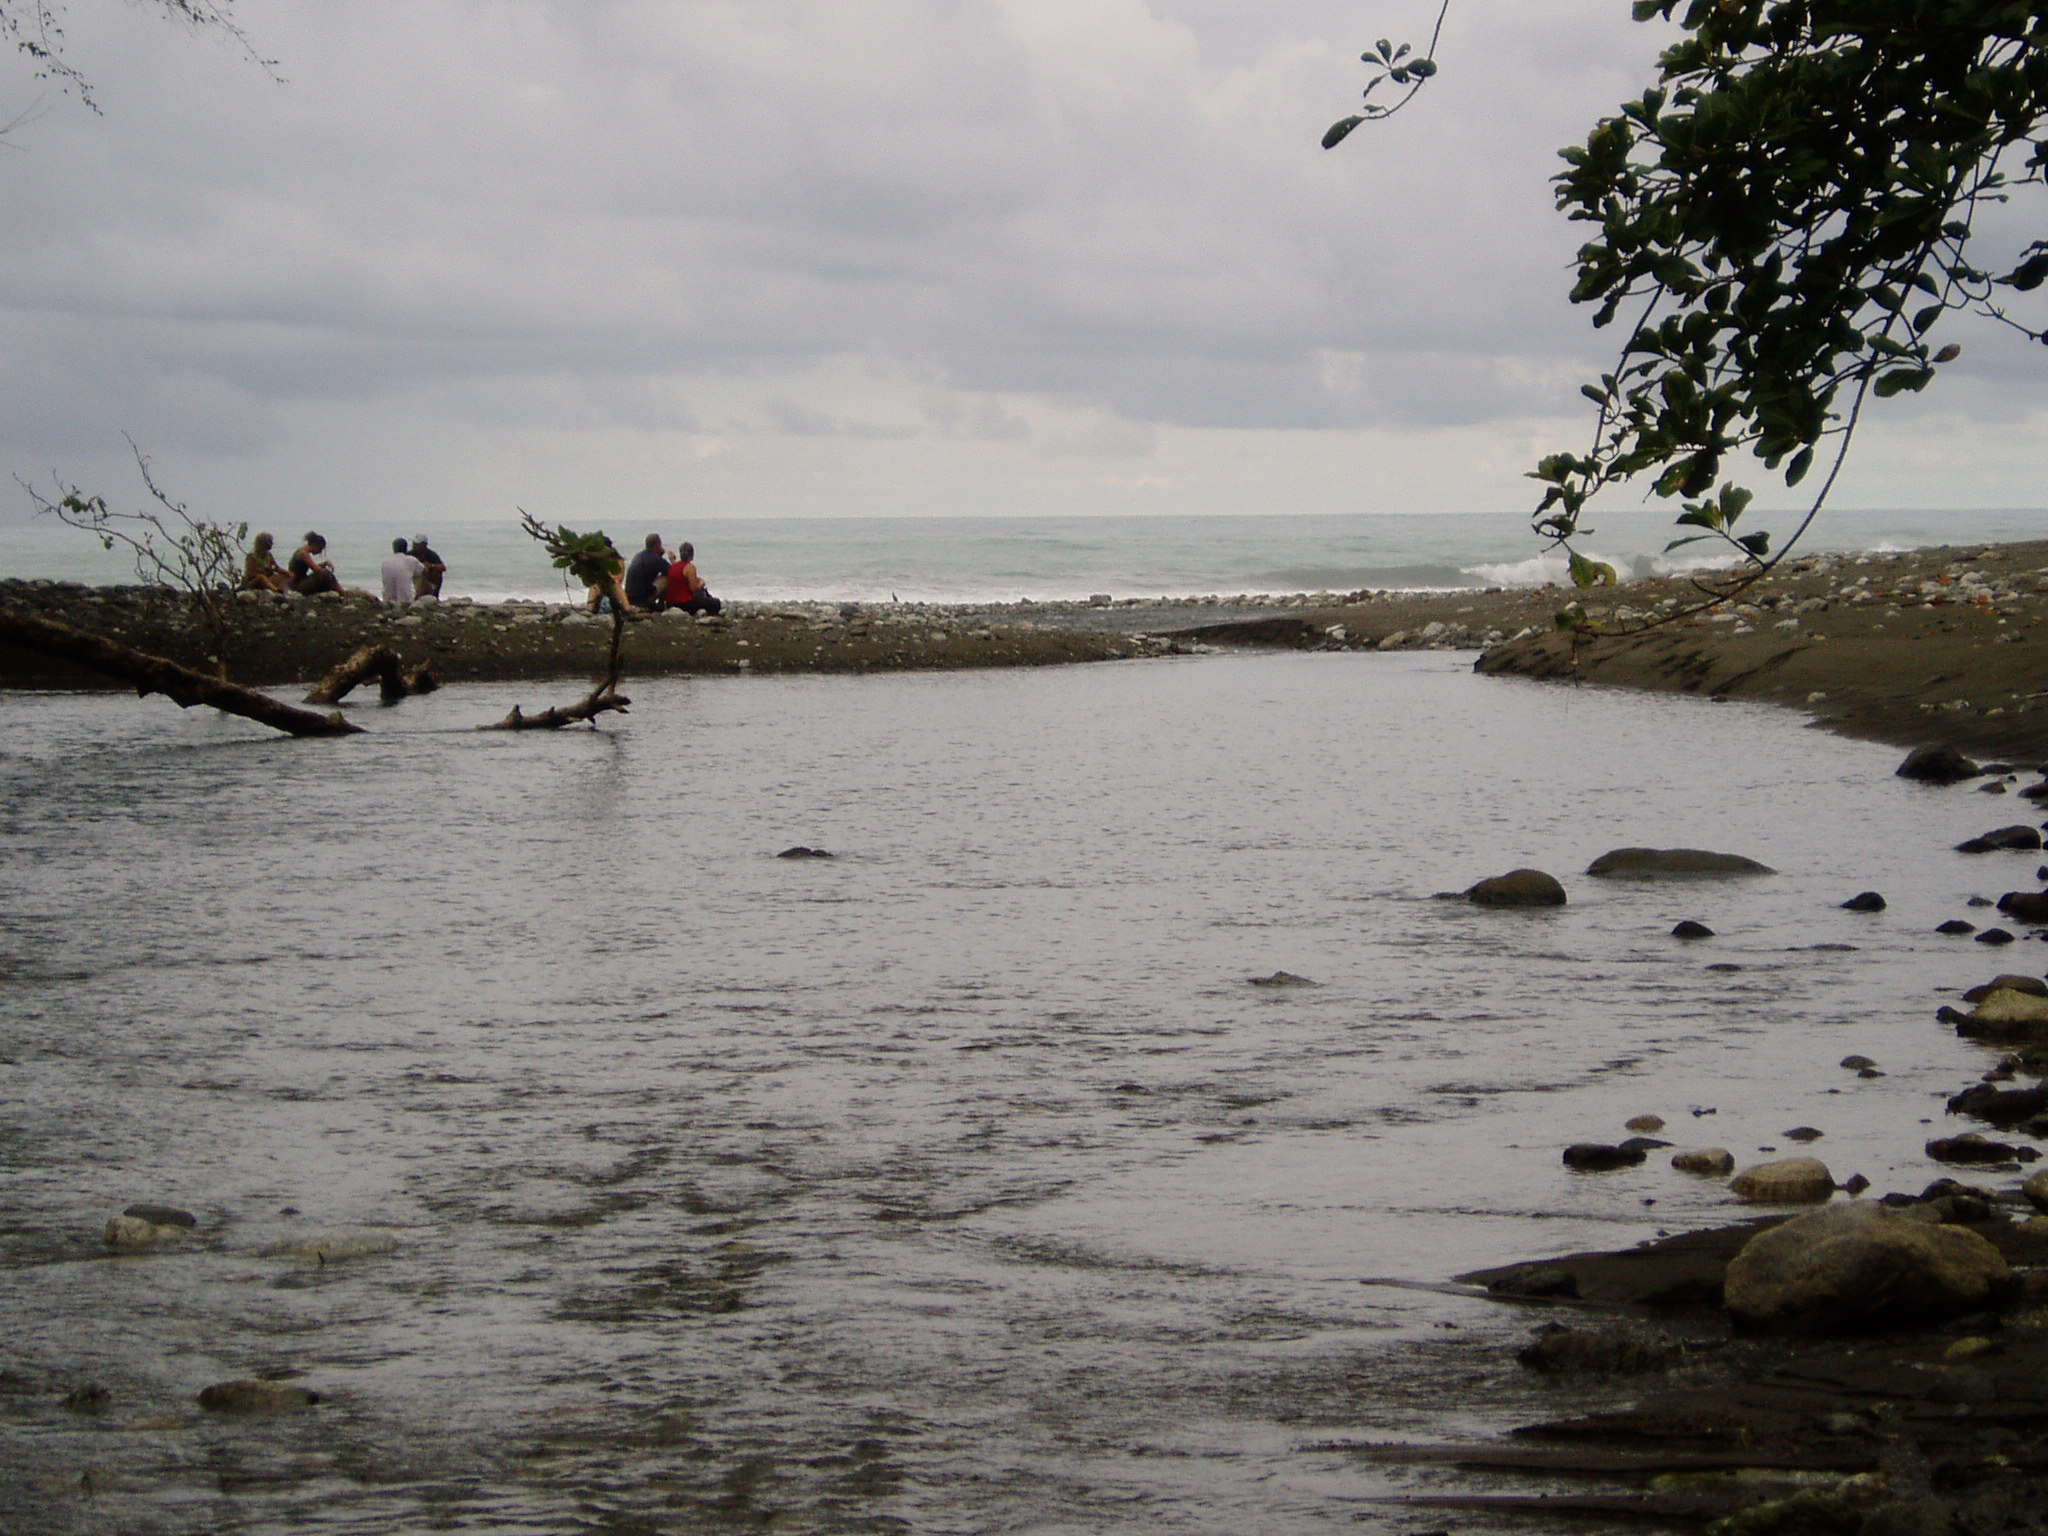 Beaches of the Osa Peninsula